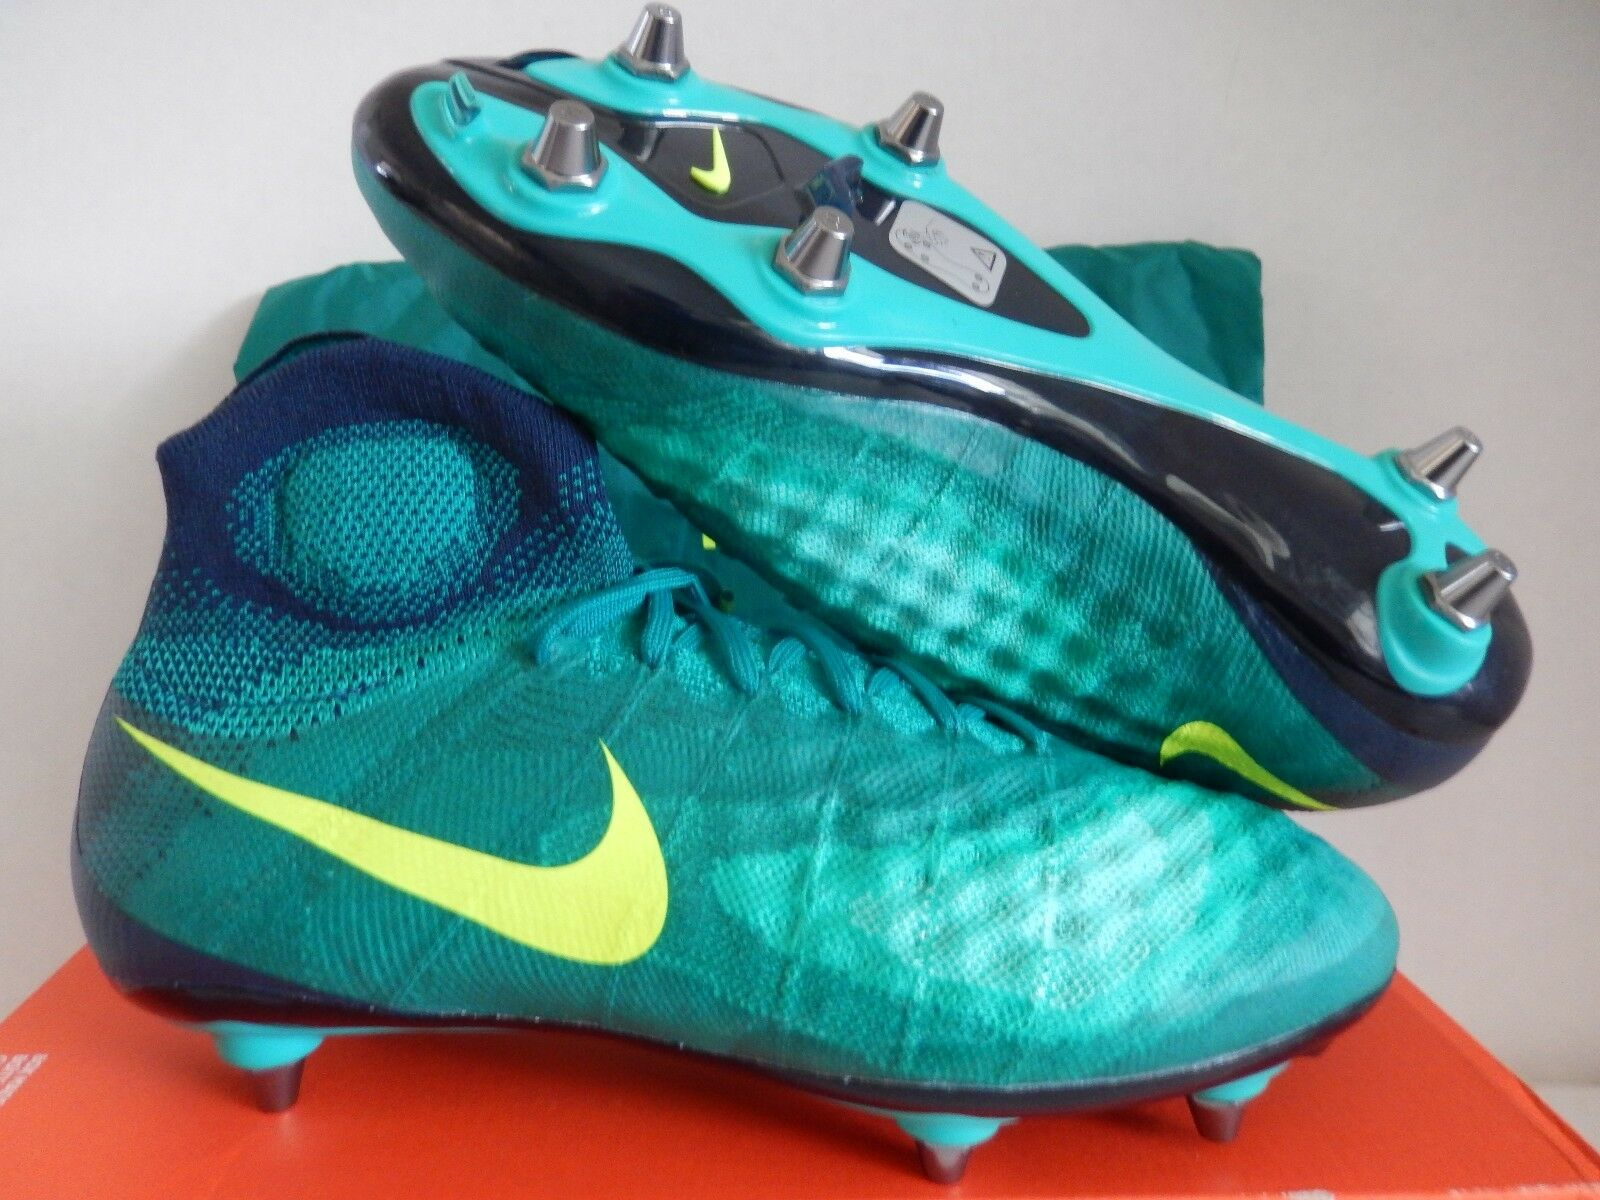 detailed look 4a5ba 900c7 Nike magista obra II SG pro Rio Rio Rio Teal Verde-obsidian reduccion de  precio